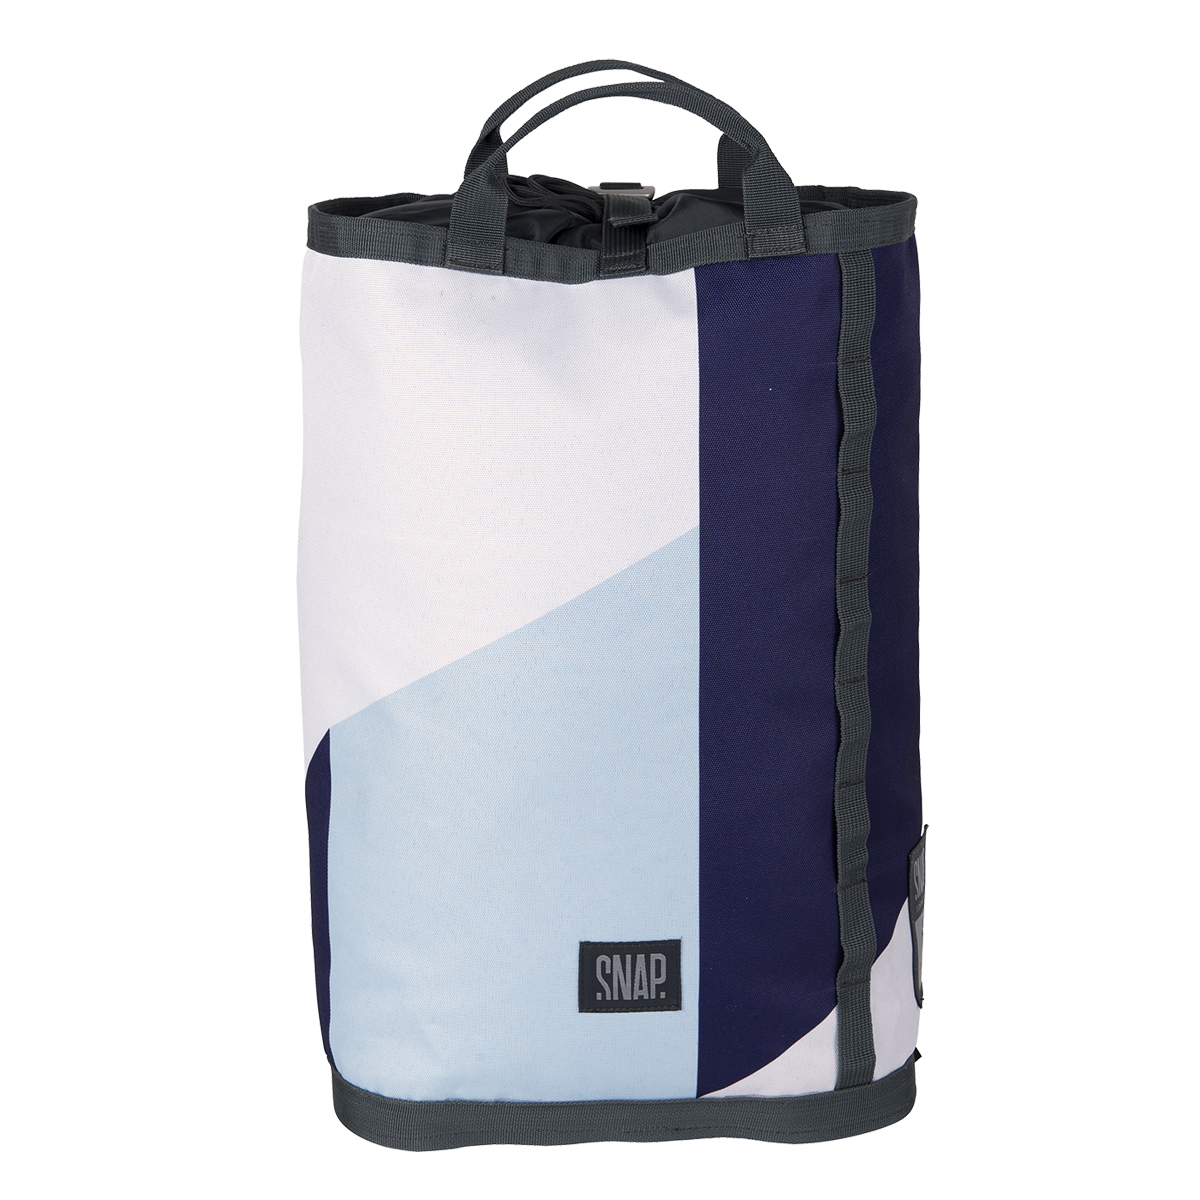 urban bag for laptop blue color